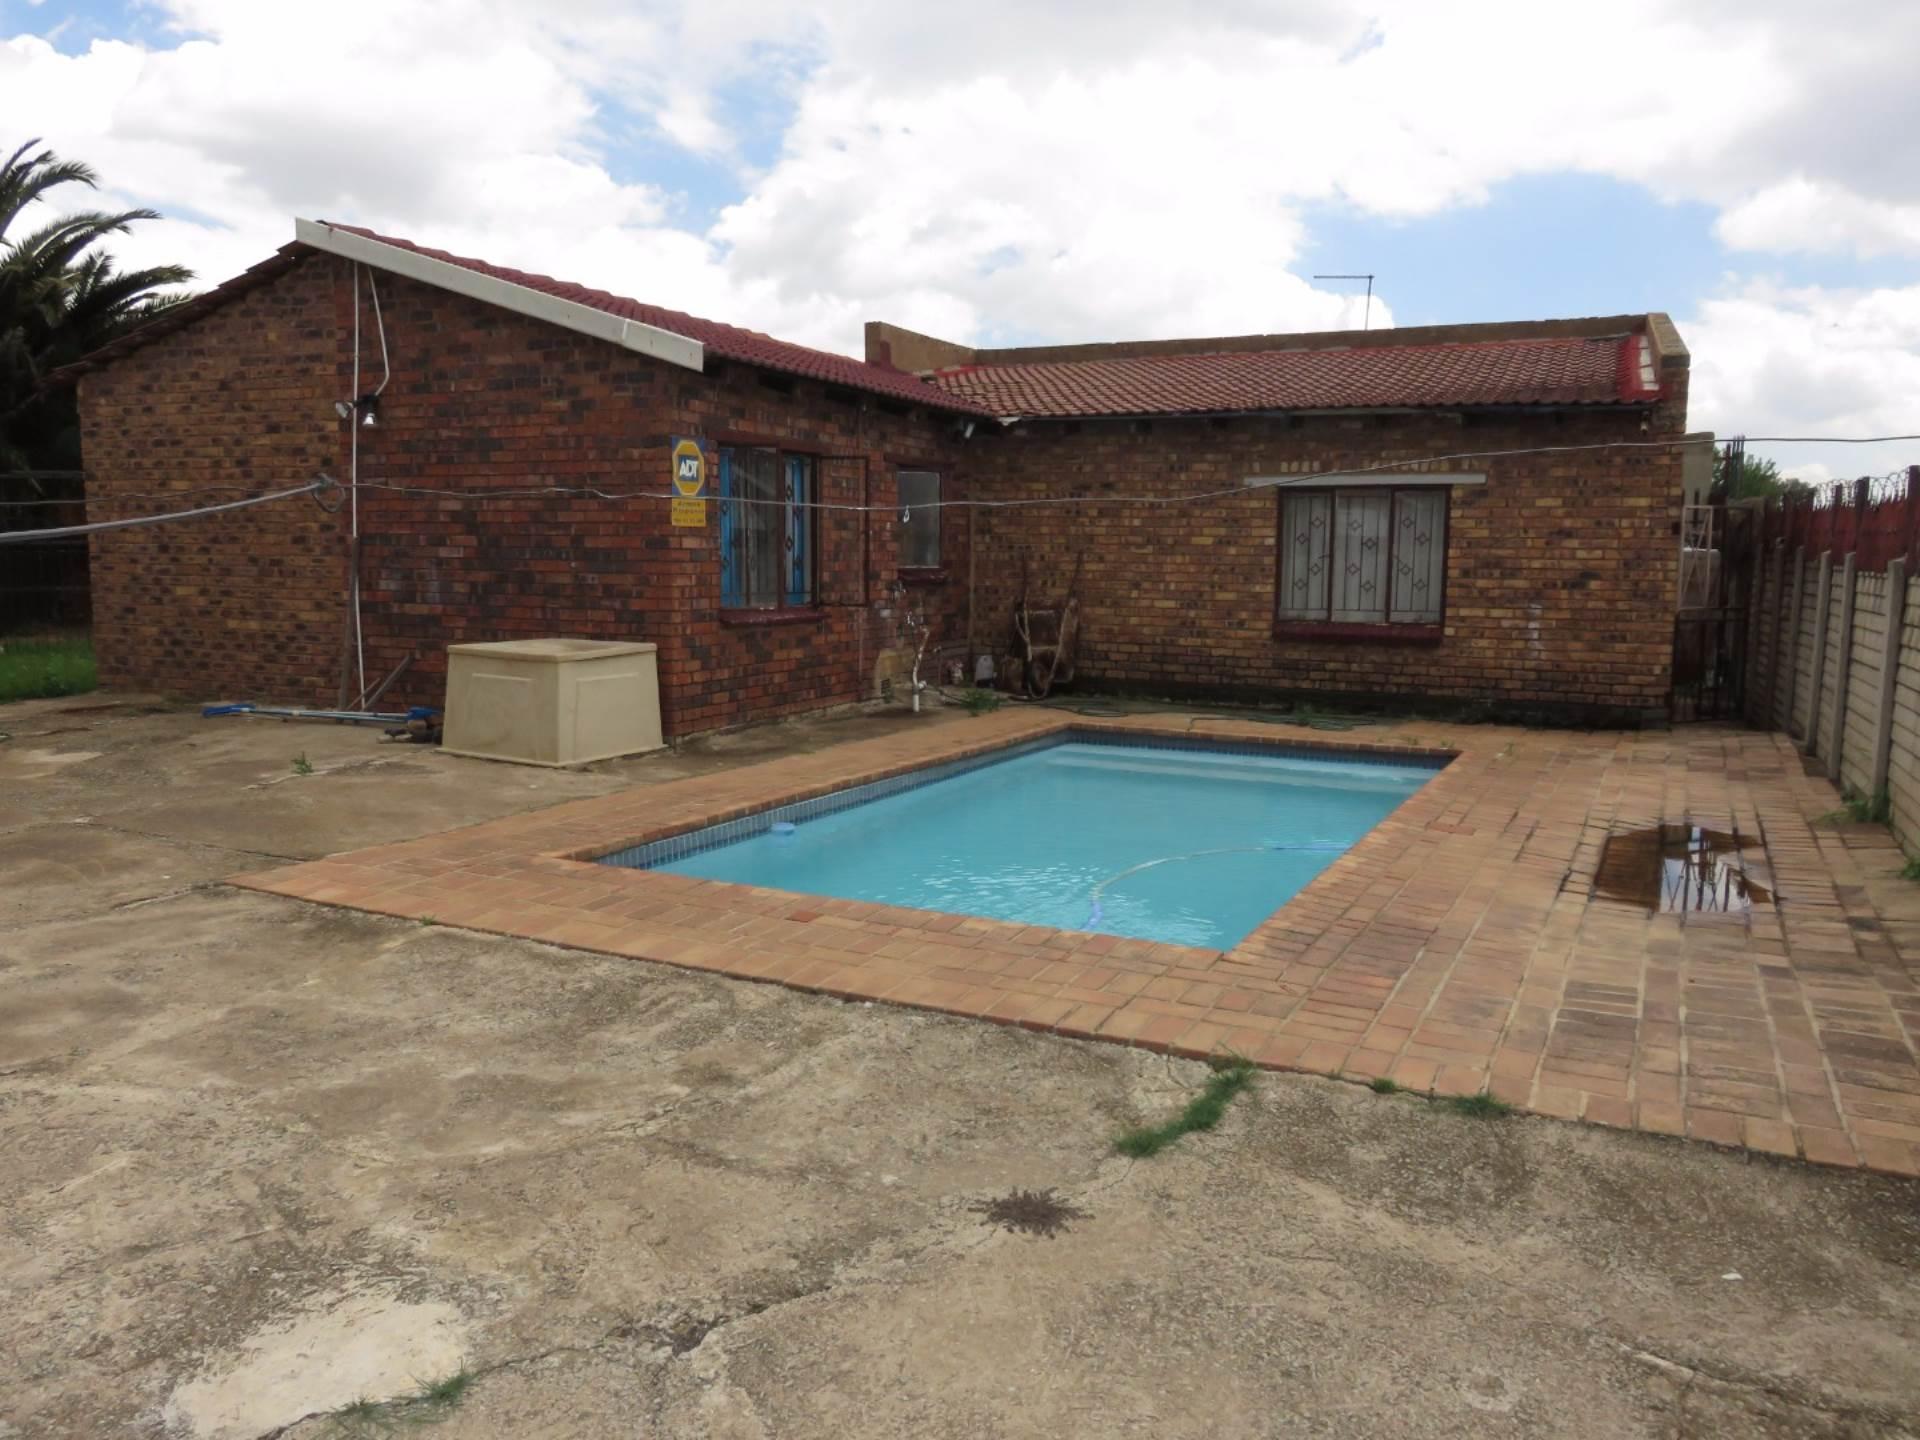 3 BedroomHouse For Sale In Delmore